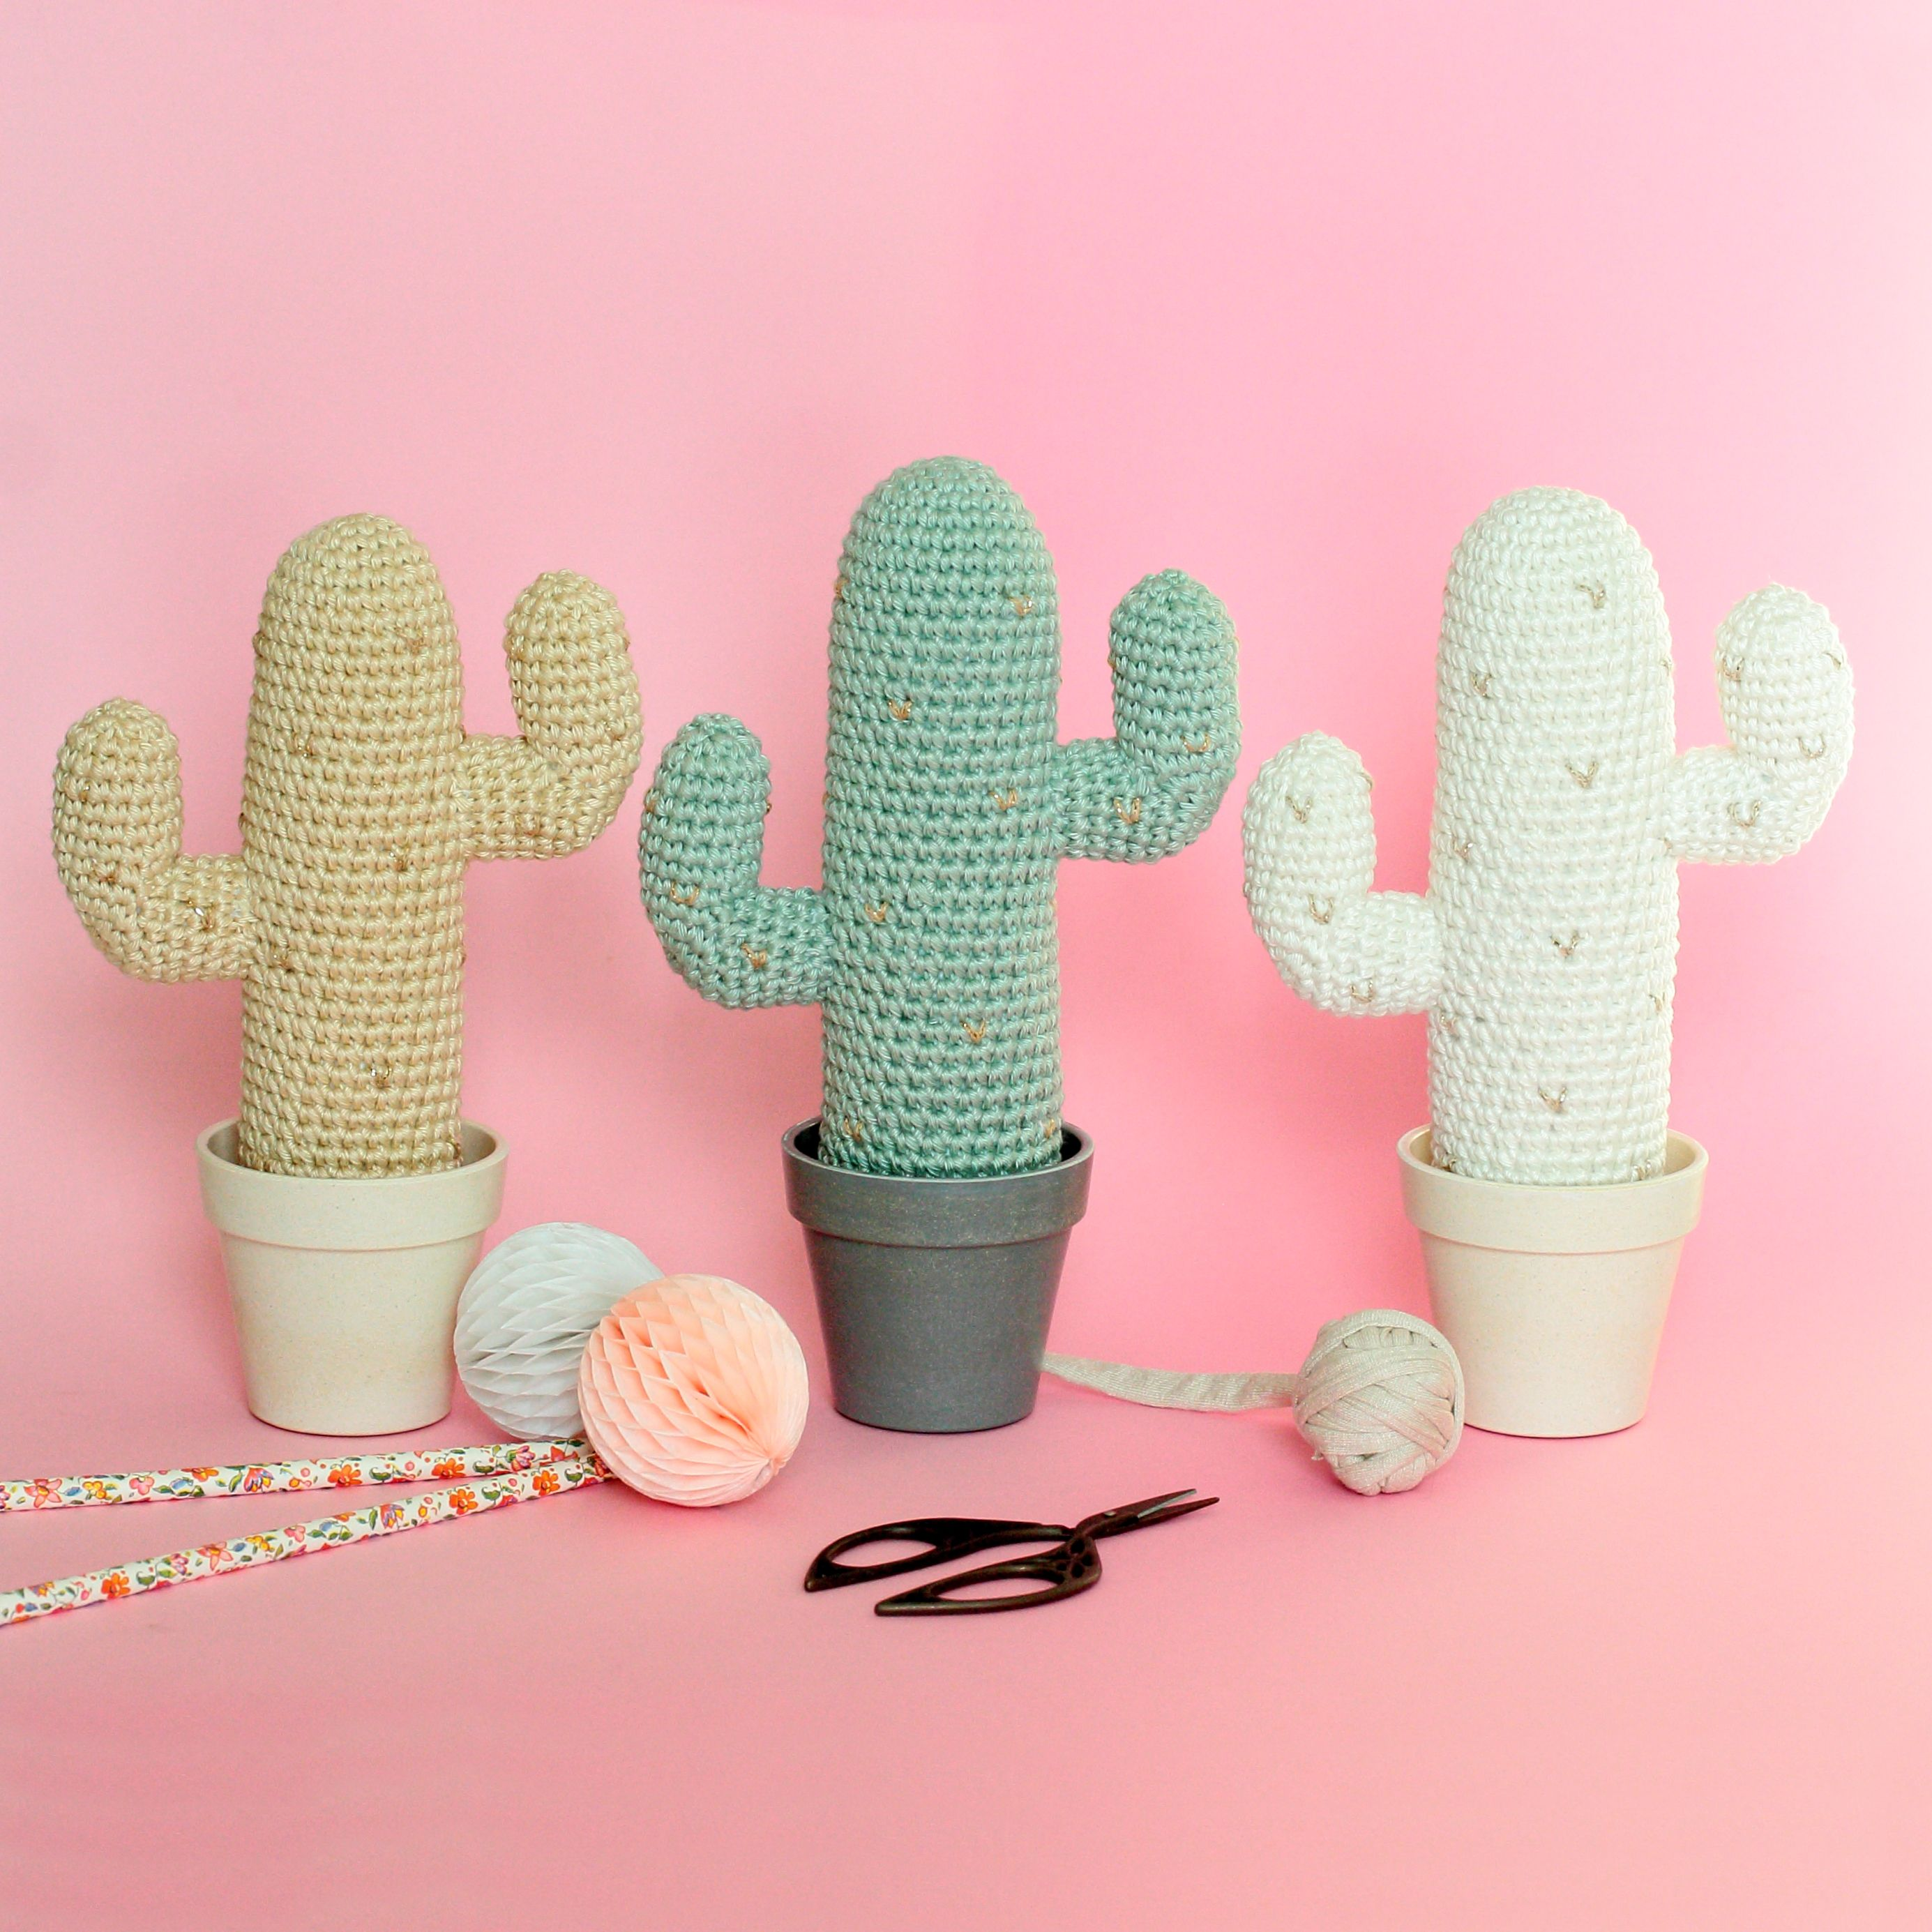 Small Cactus Crochet Pattern, Cacti Crochet Pattern, Ball Cactus ... | 2770x2770